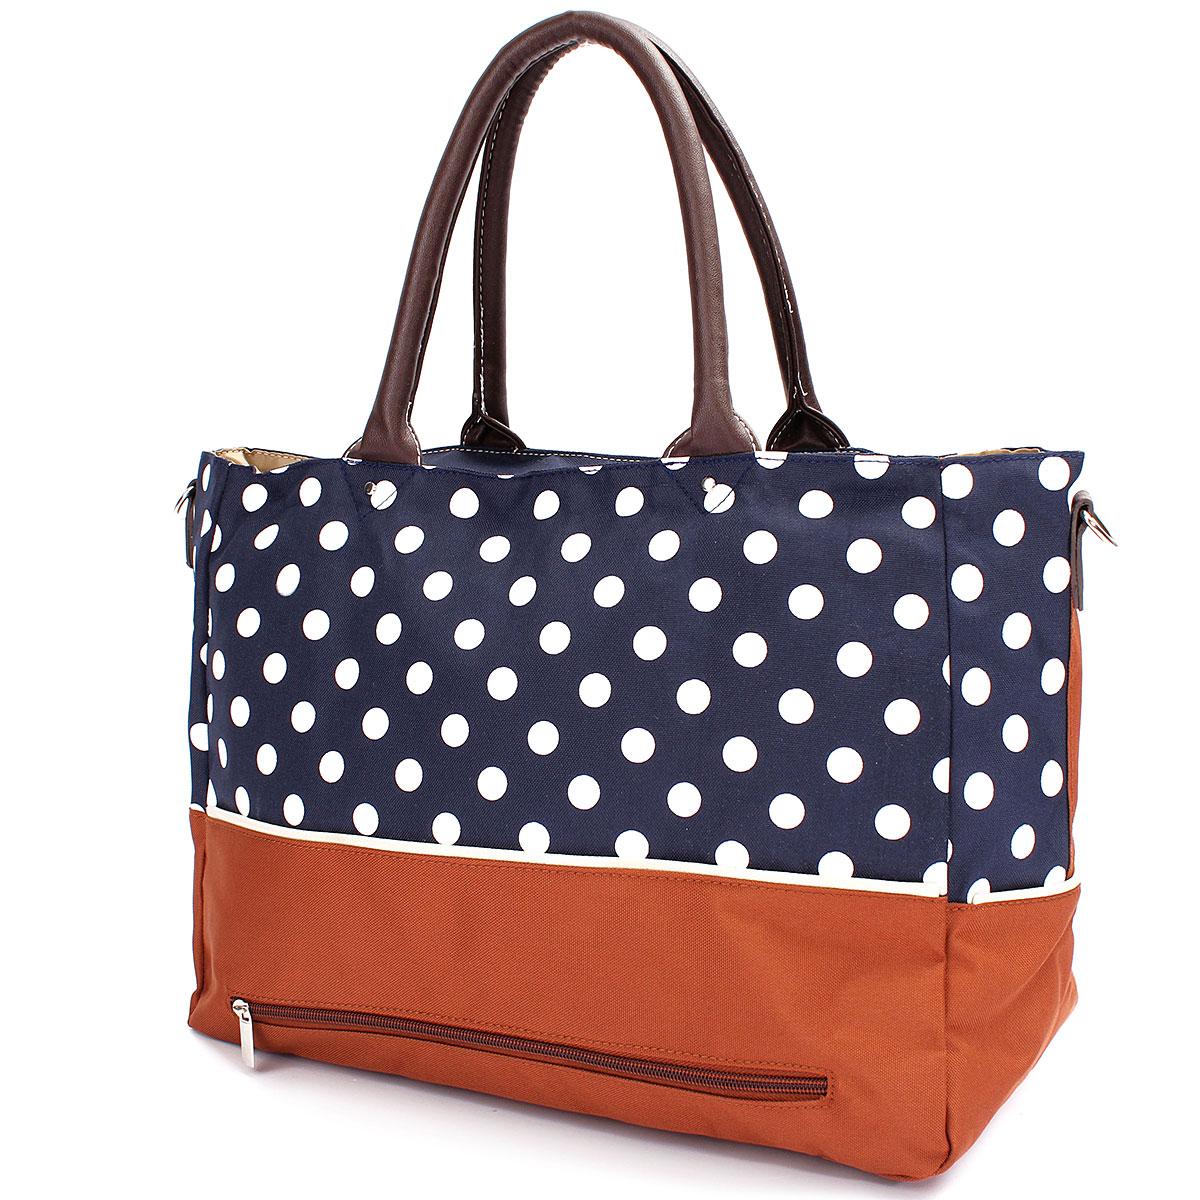 Designer Diaper Bags : Pcs new women designer baby changing bag diaper nappy